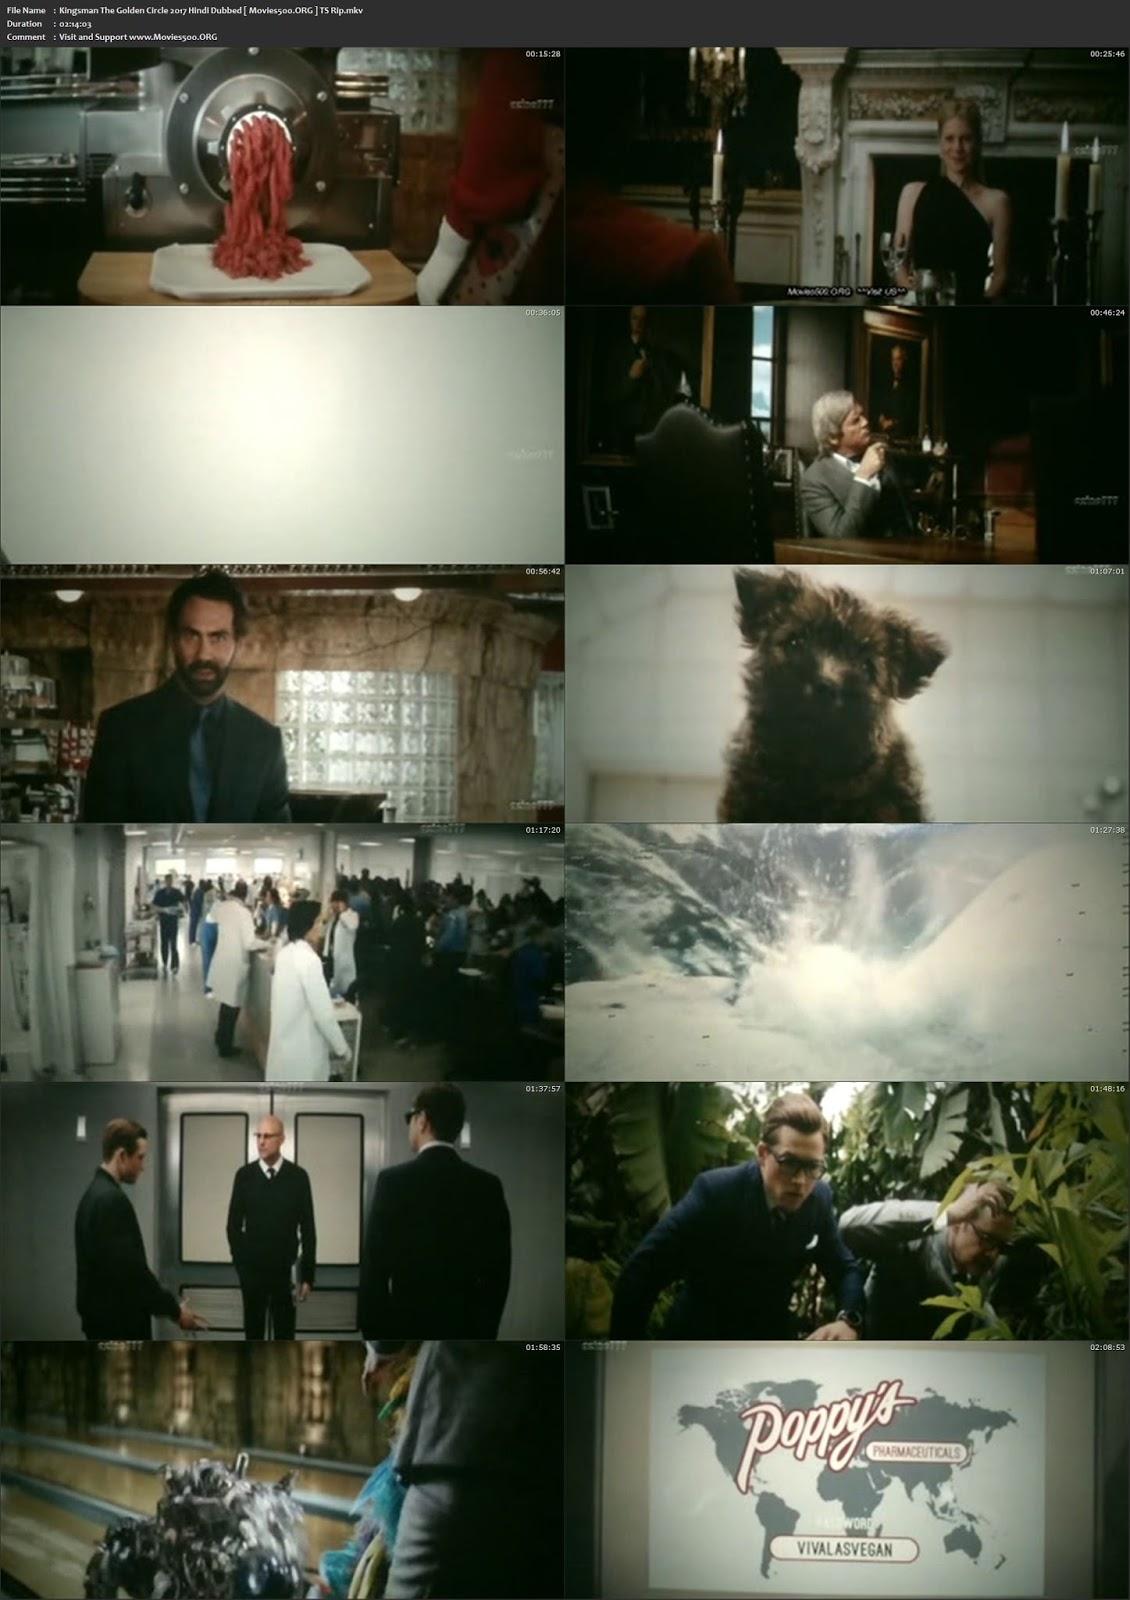 Kingsman The Golden Circle 2017 English 850MB HDTS 720p at movies500.me